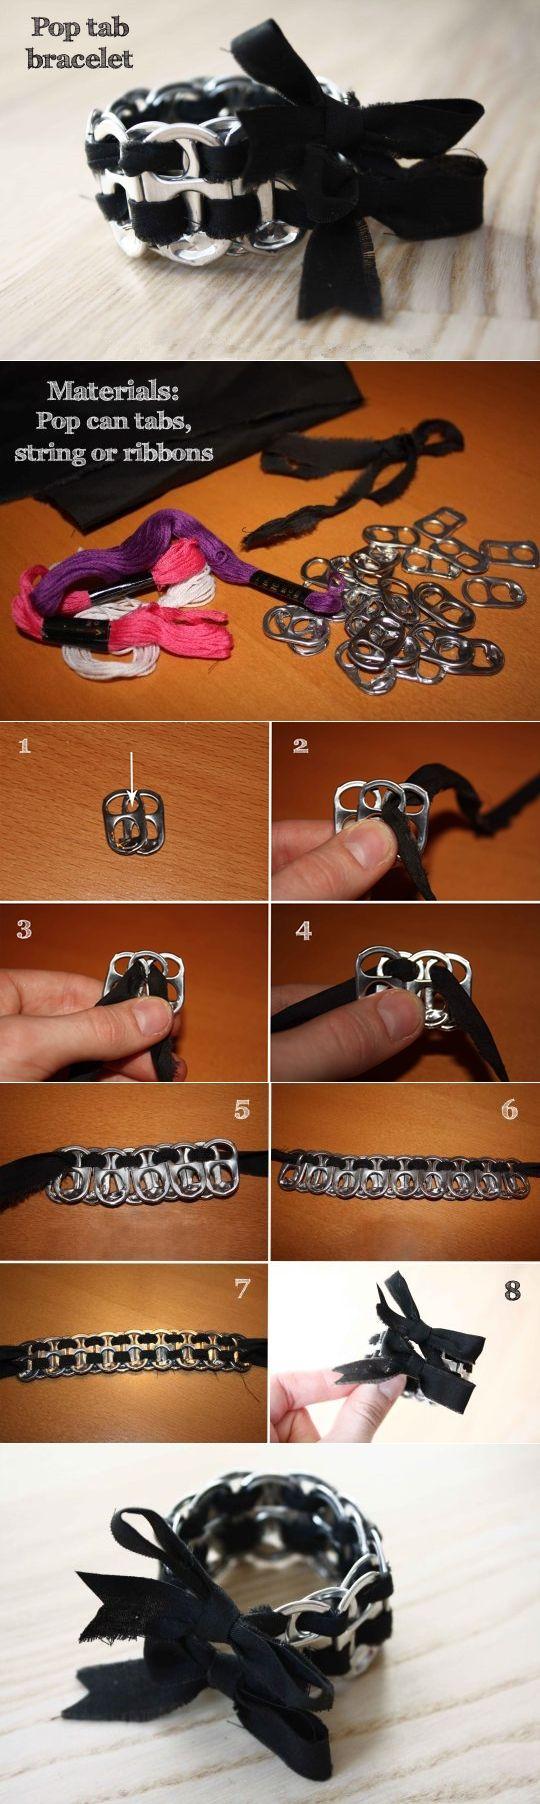 (via DIY Pop Tab Bracelet | www.FabArtDIY.com):